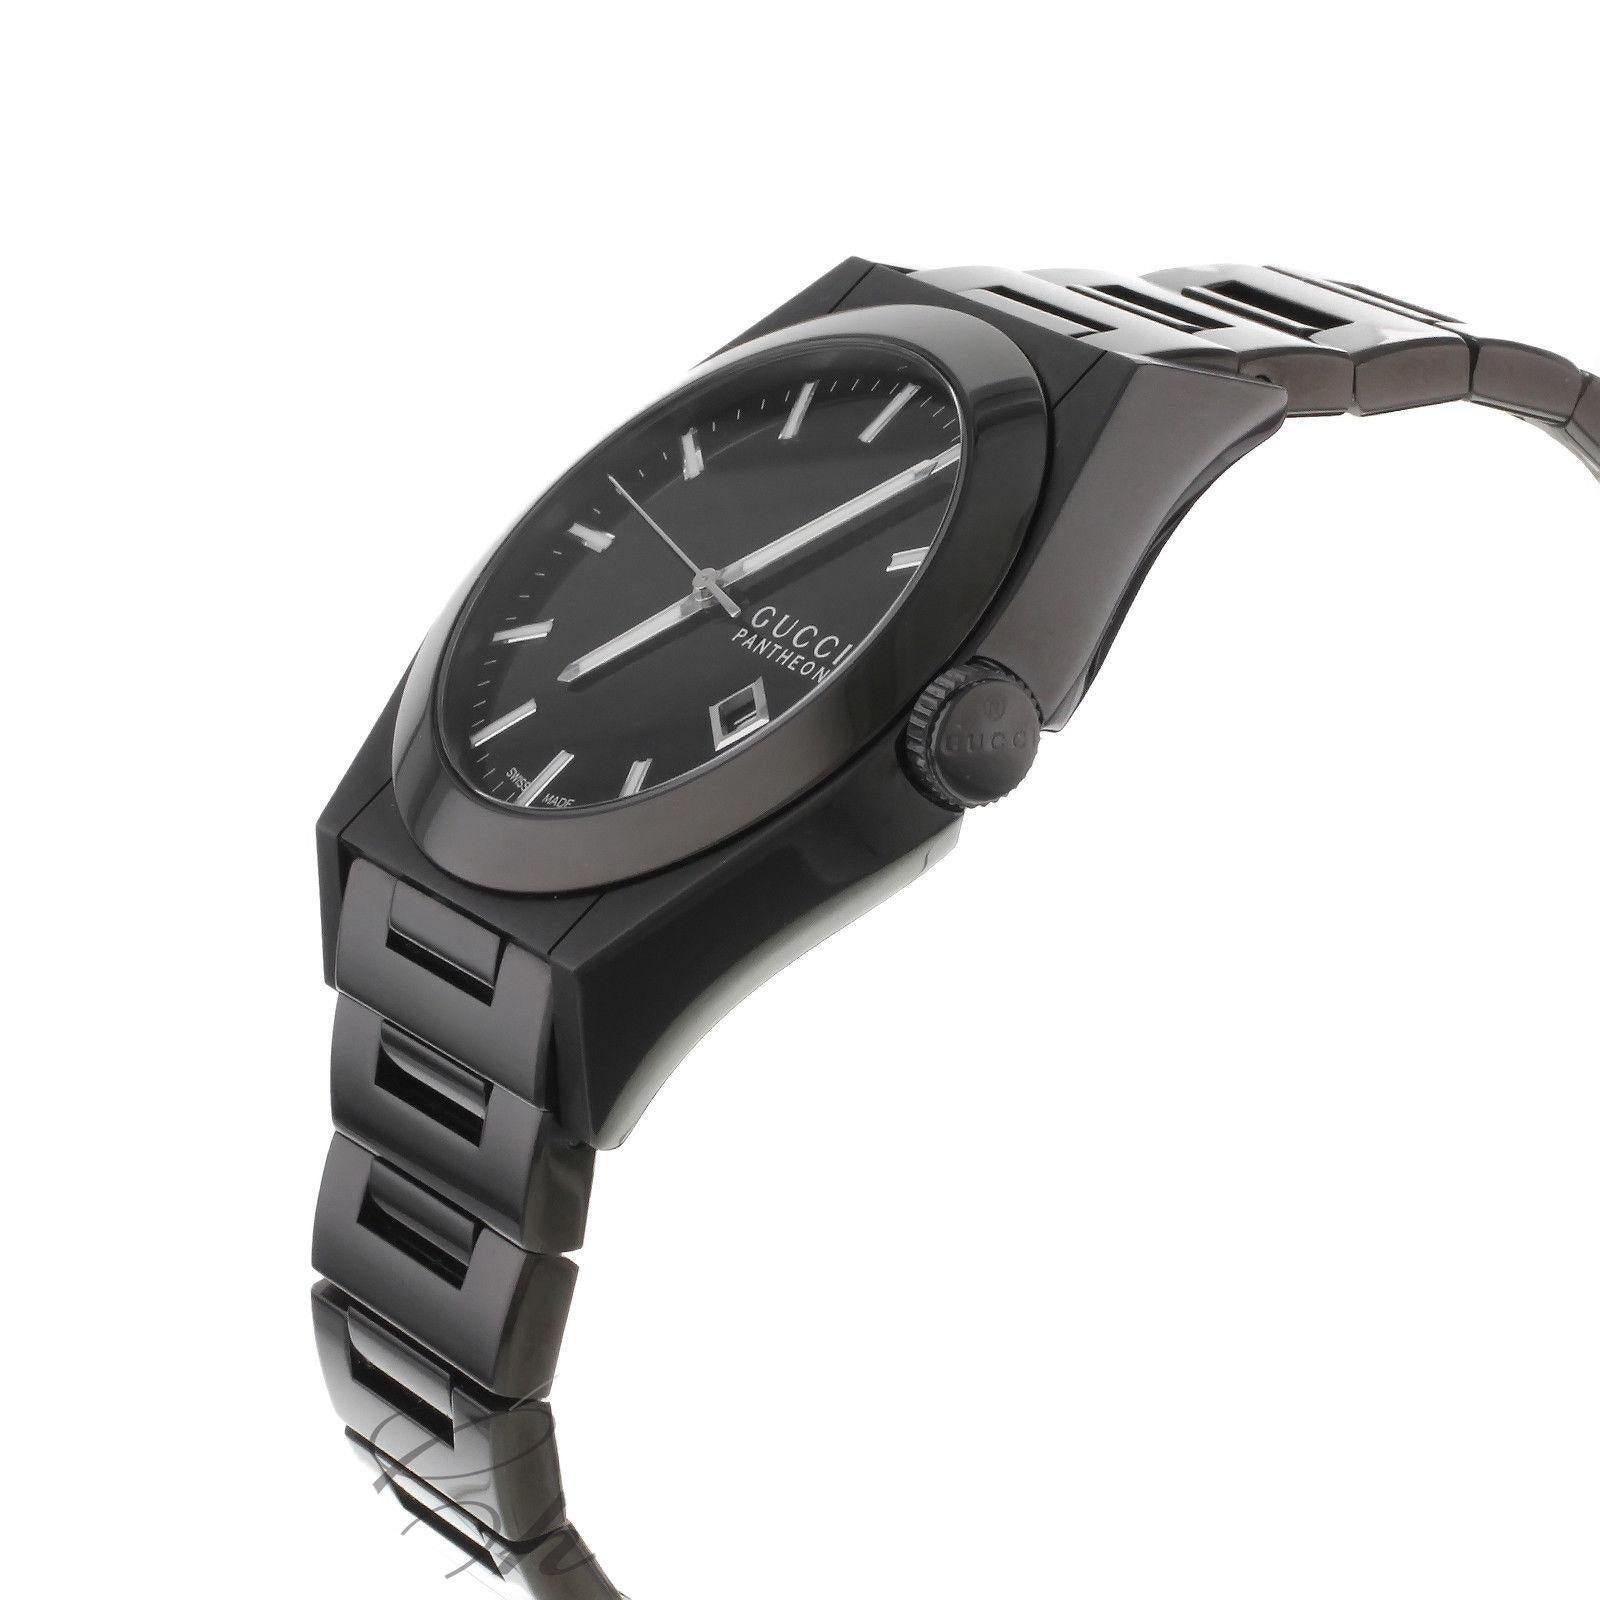 f393211e2d9 Gucci Pantheon 115 YA115244 Black Ion Plated Steel Quartz Men s Watch For  Sale at 1stdibs